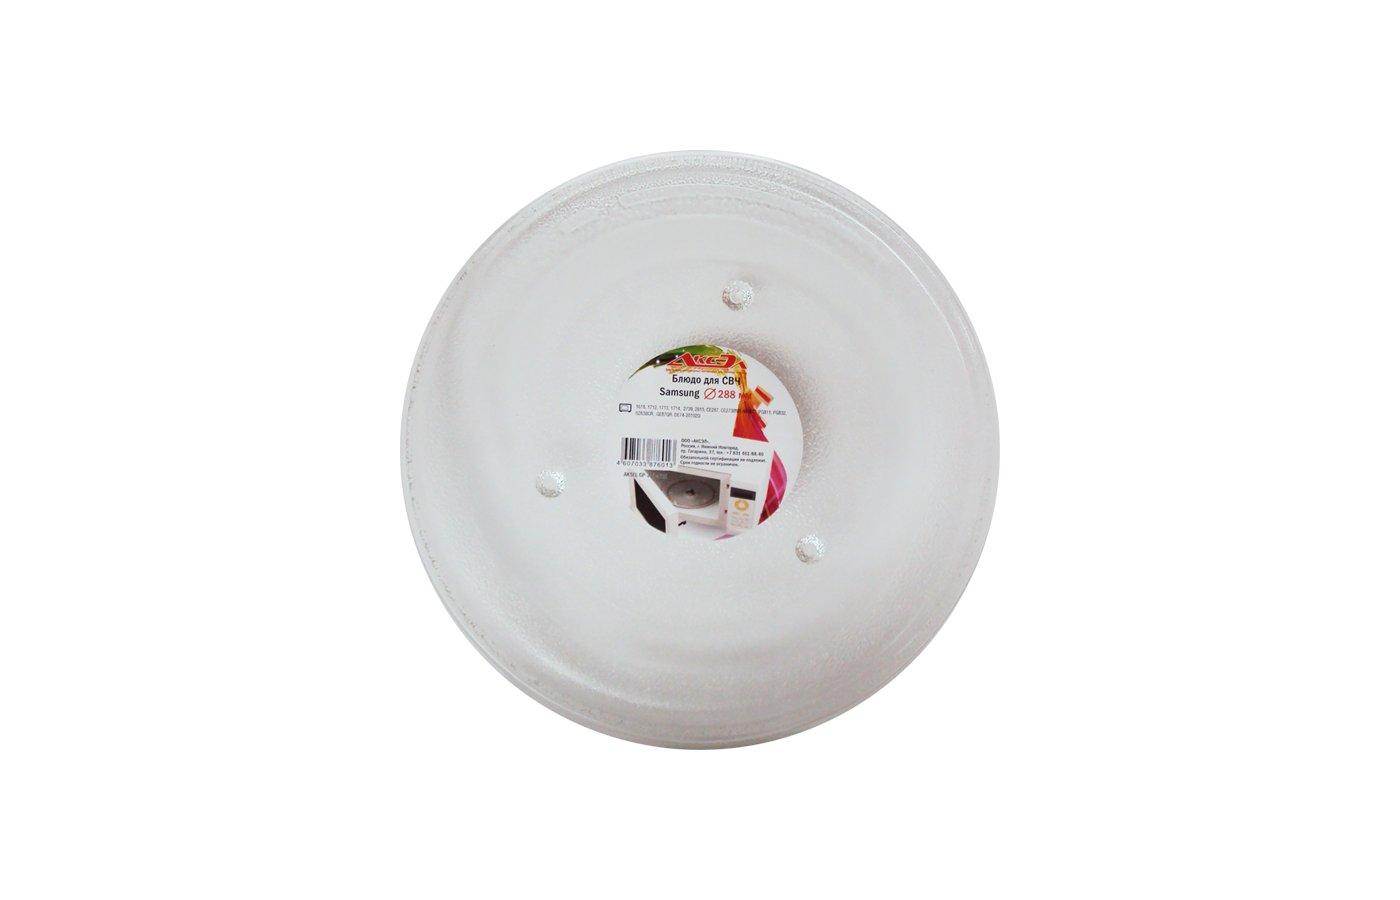 Тарелка для СВЧ AKSEL/EURO EUR N-12 Тарелка для СВЧ GP-288-SAM